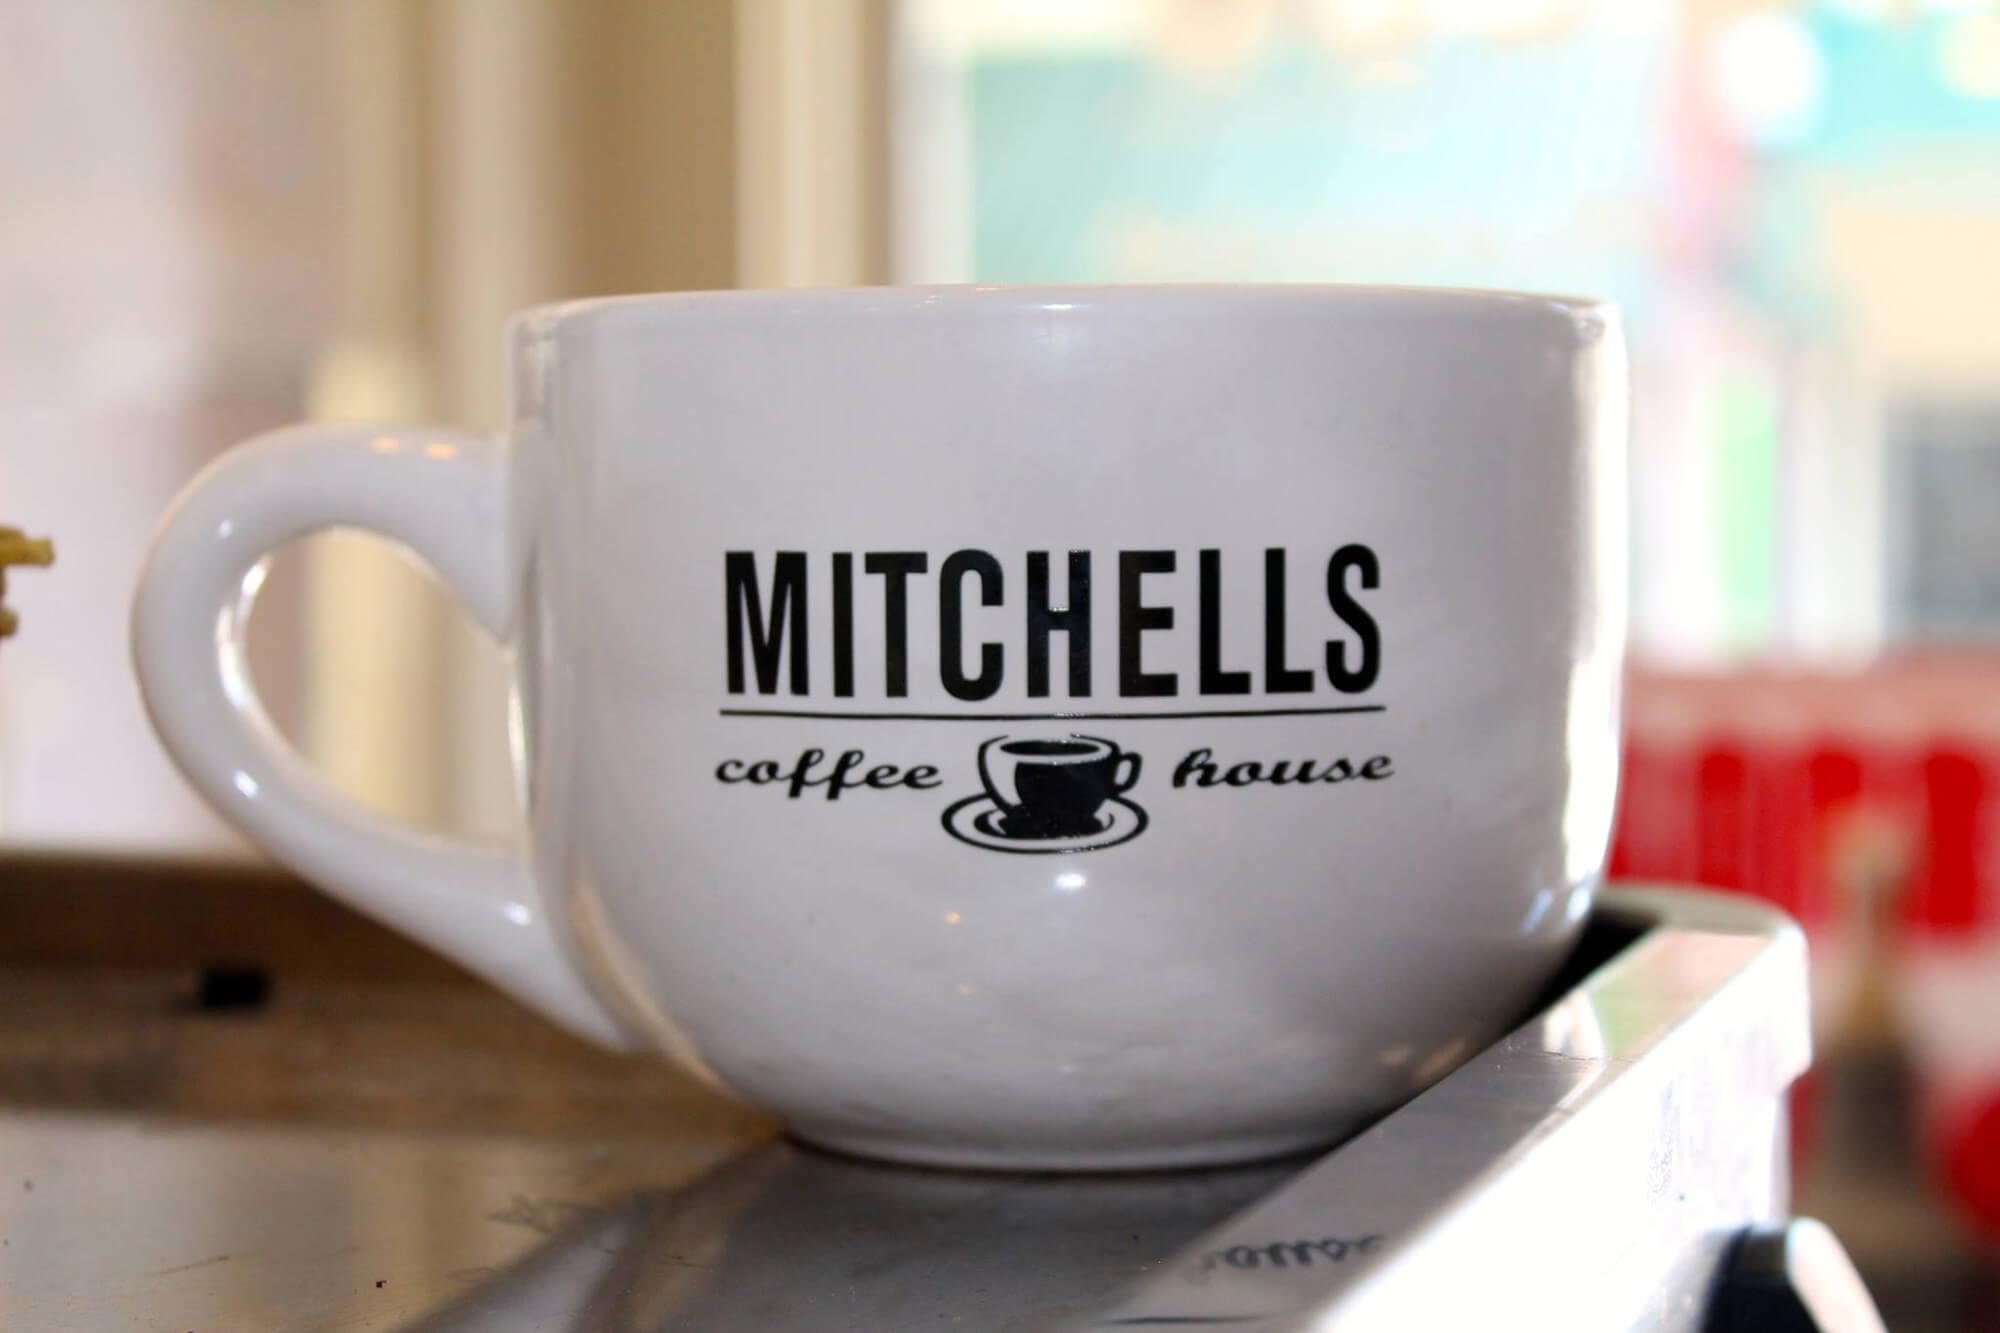 Mitchell's Coffee